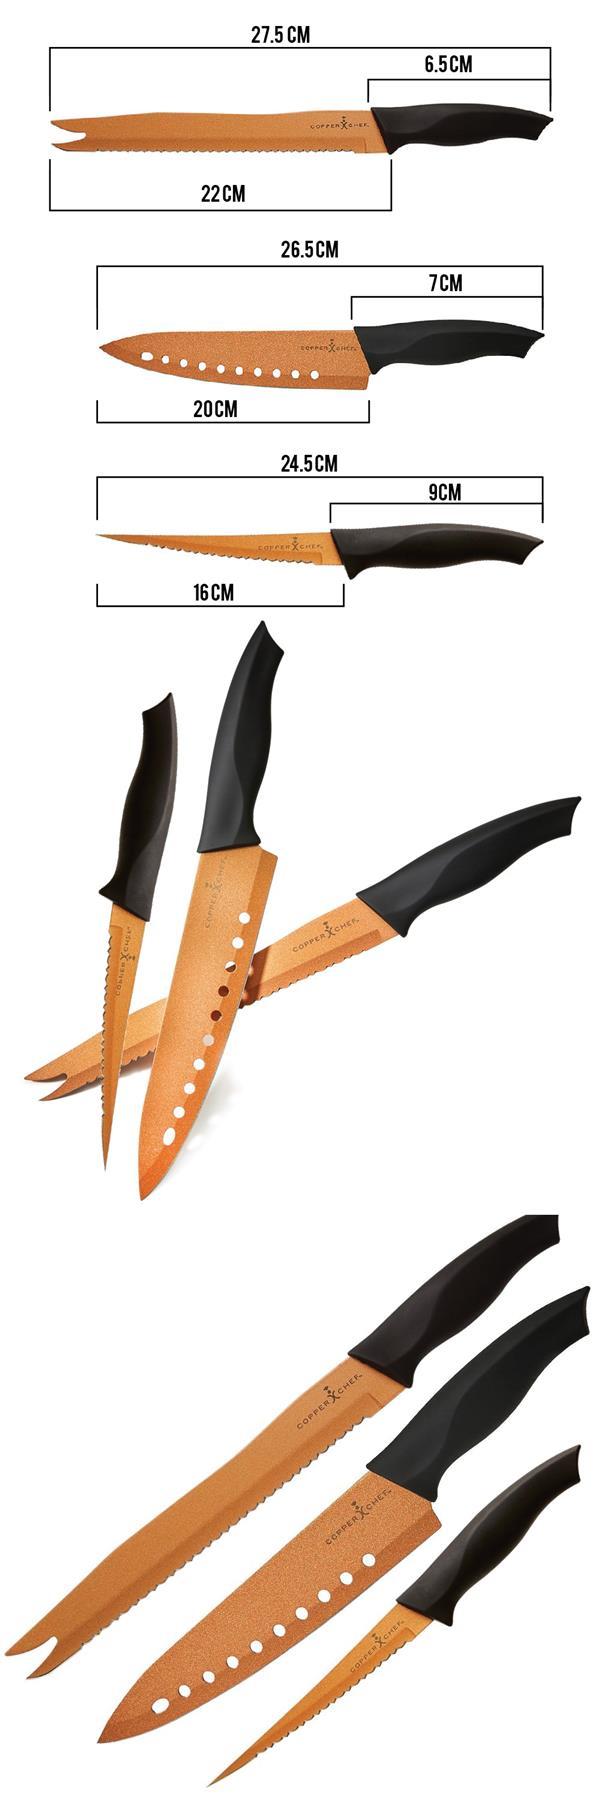 Copper Chef Ever Sharp Knife Set 3 Piece Non Stick Kitchen Cutlery